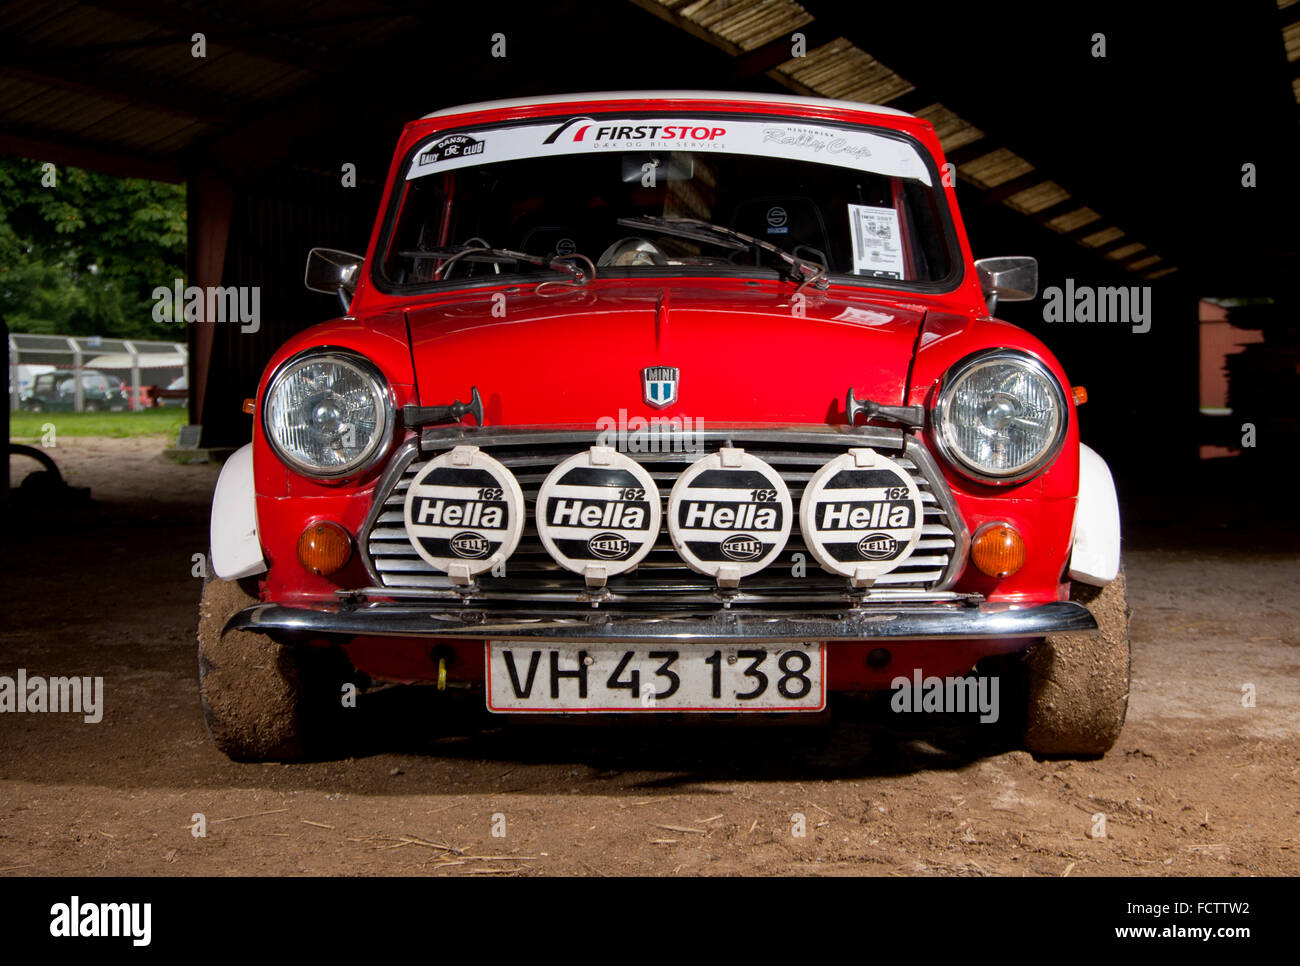 Classic Mini rally car Stock Photo: 93974078 - Alamy